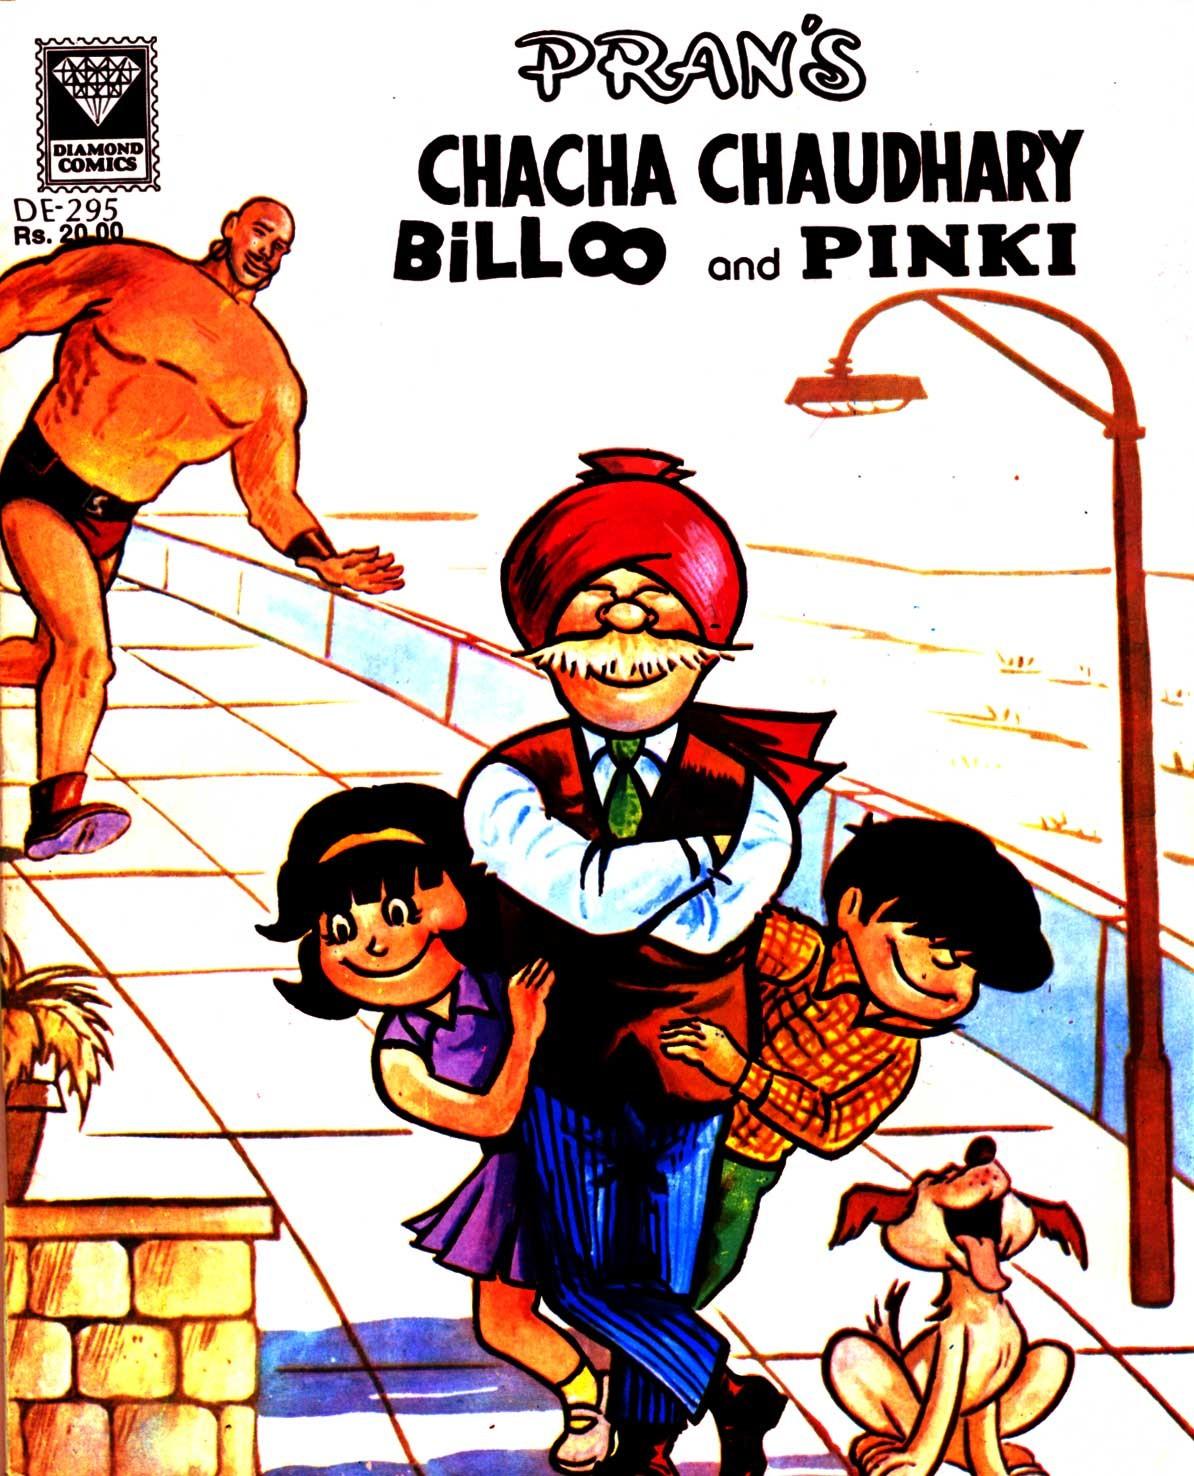 Chacha Chaudhary, Comicandour, Comic books, Diamond Comics